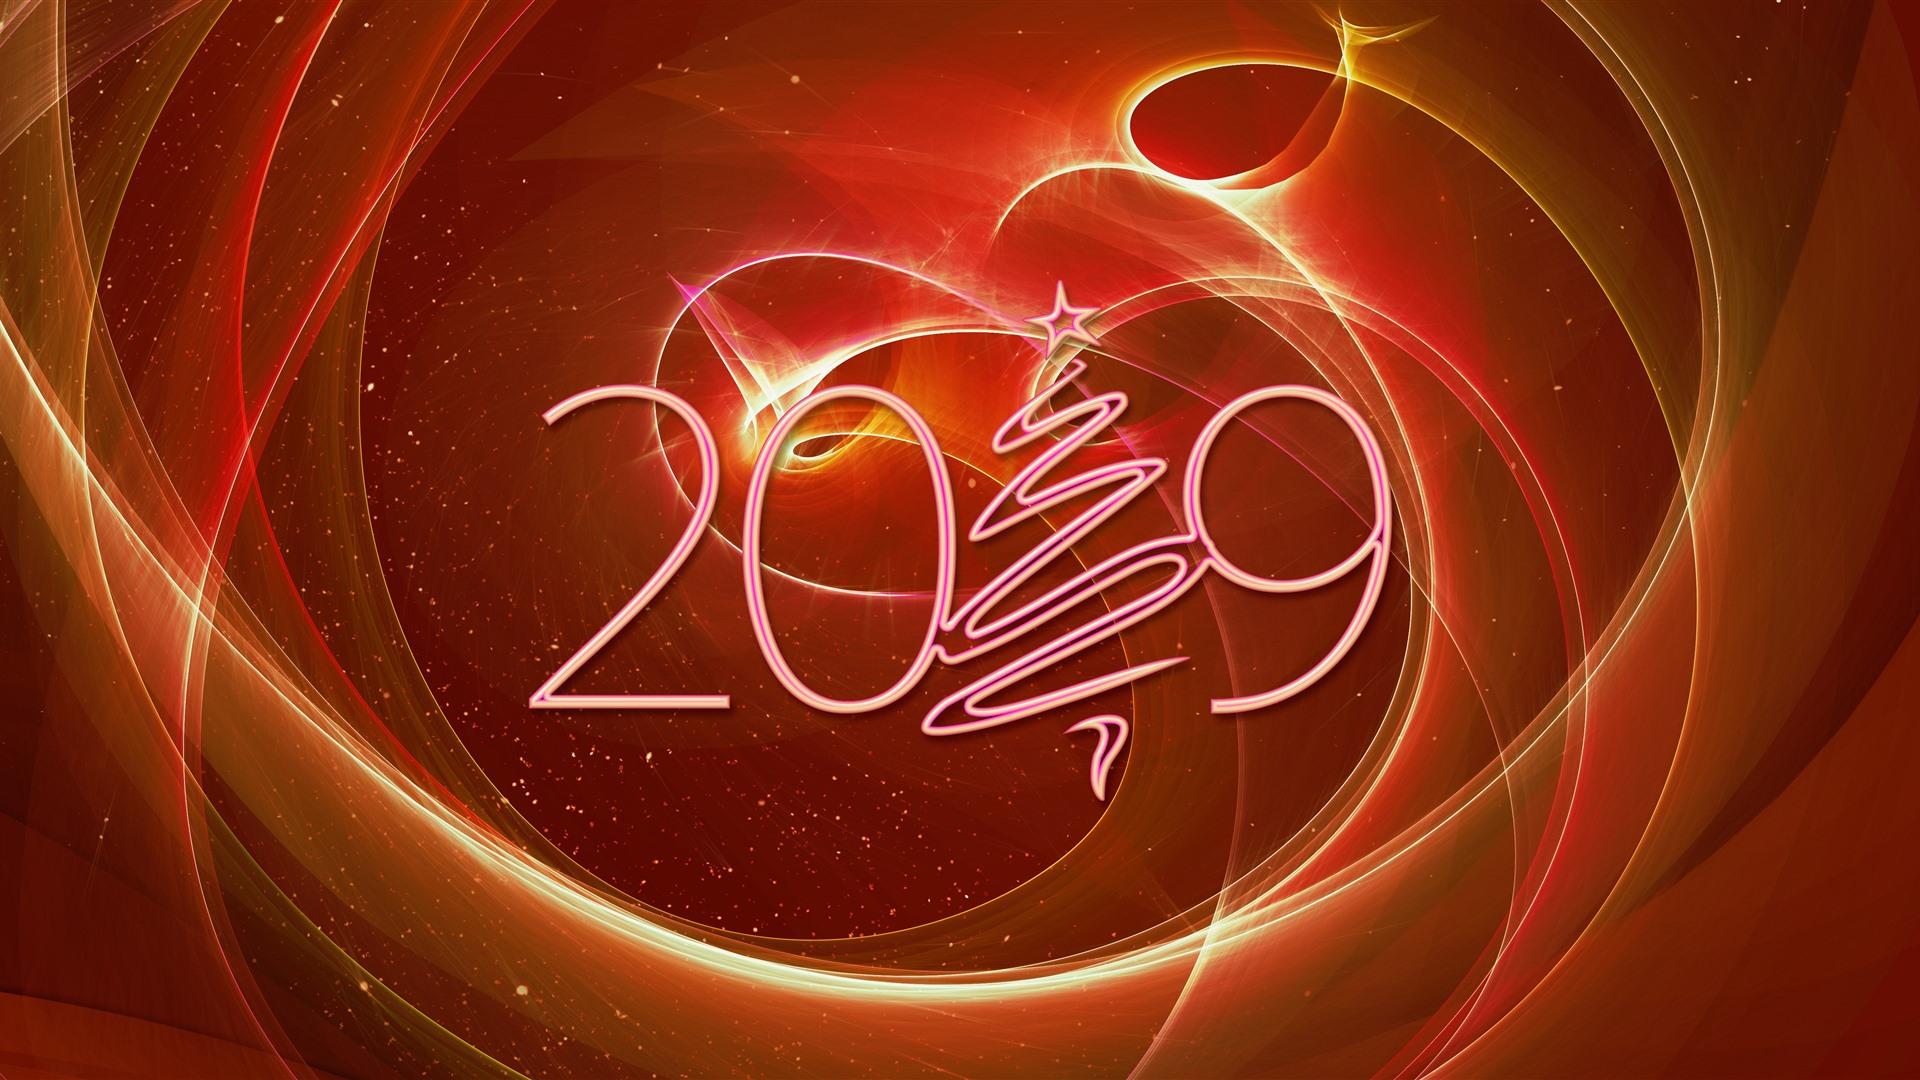 Wallpaper 2019 New Year, Christmas tree, creative design